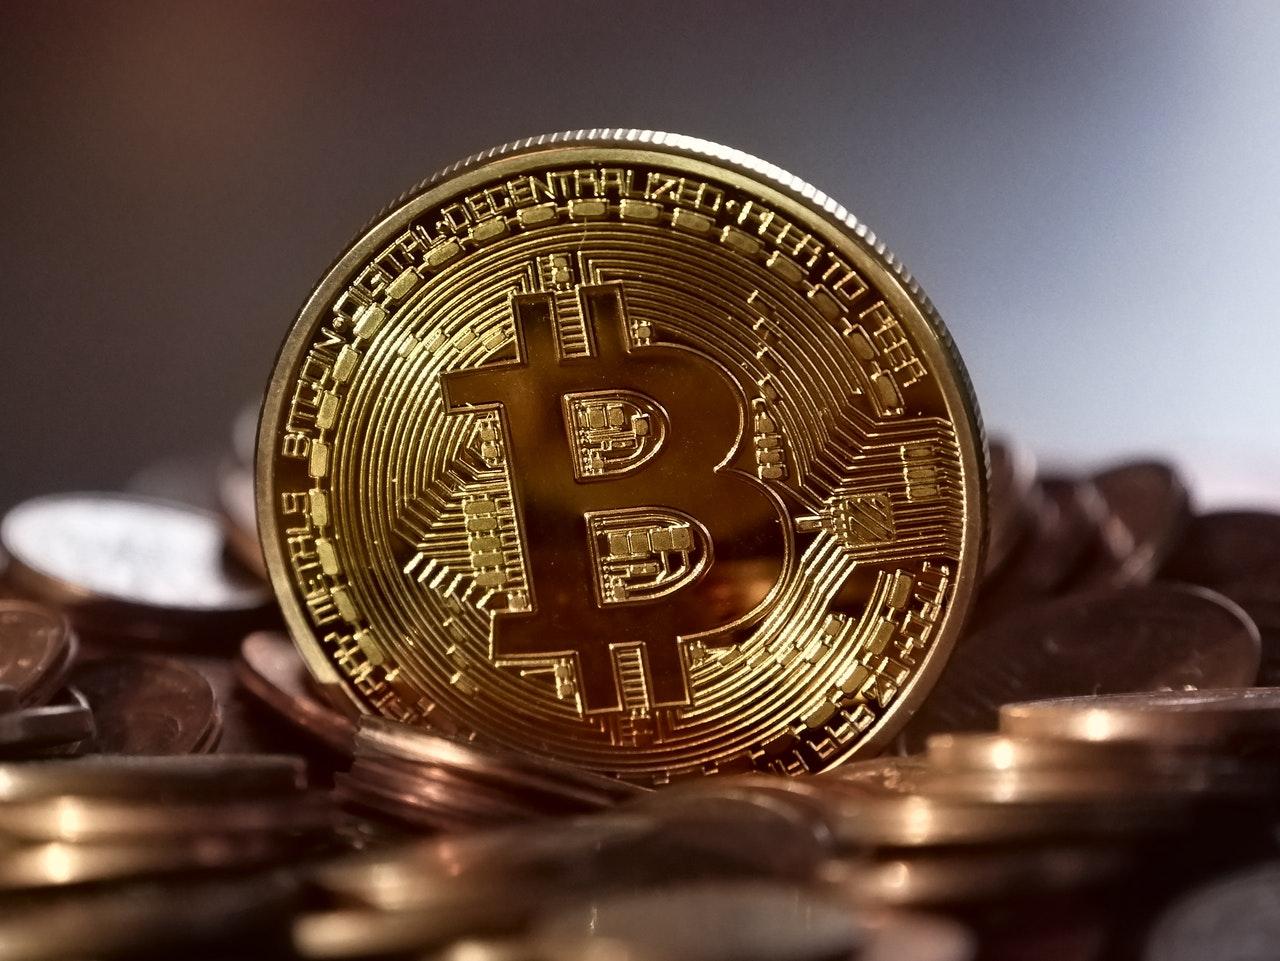 Buying Bitcoin at the house bank